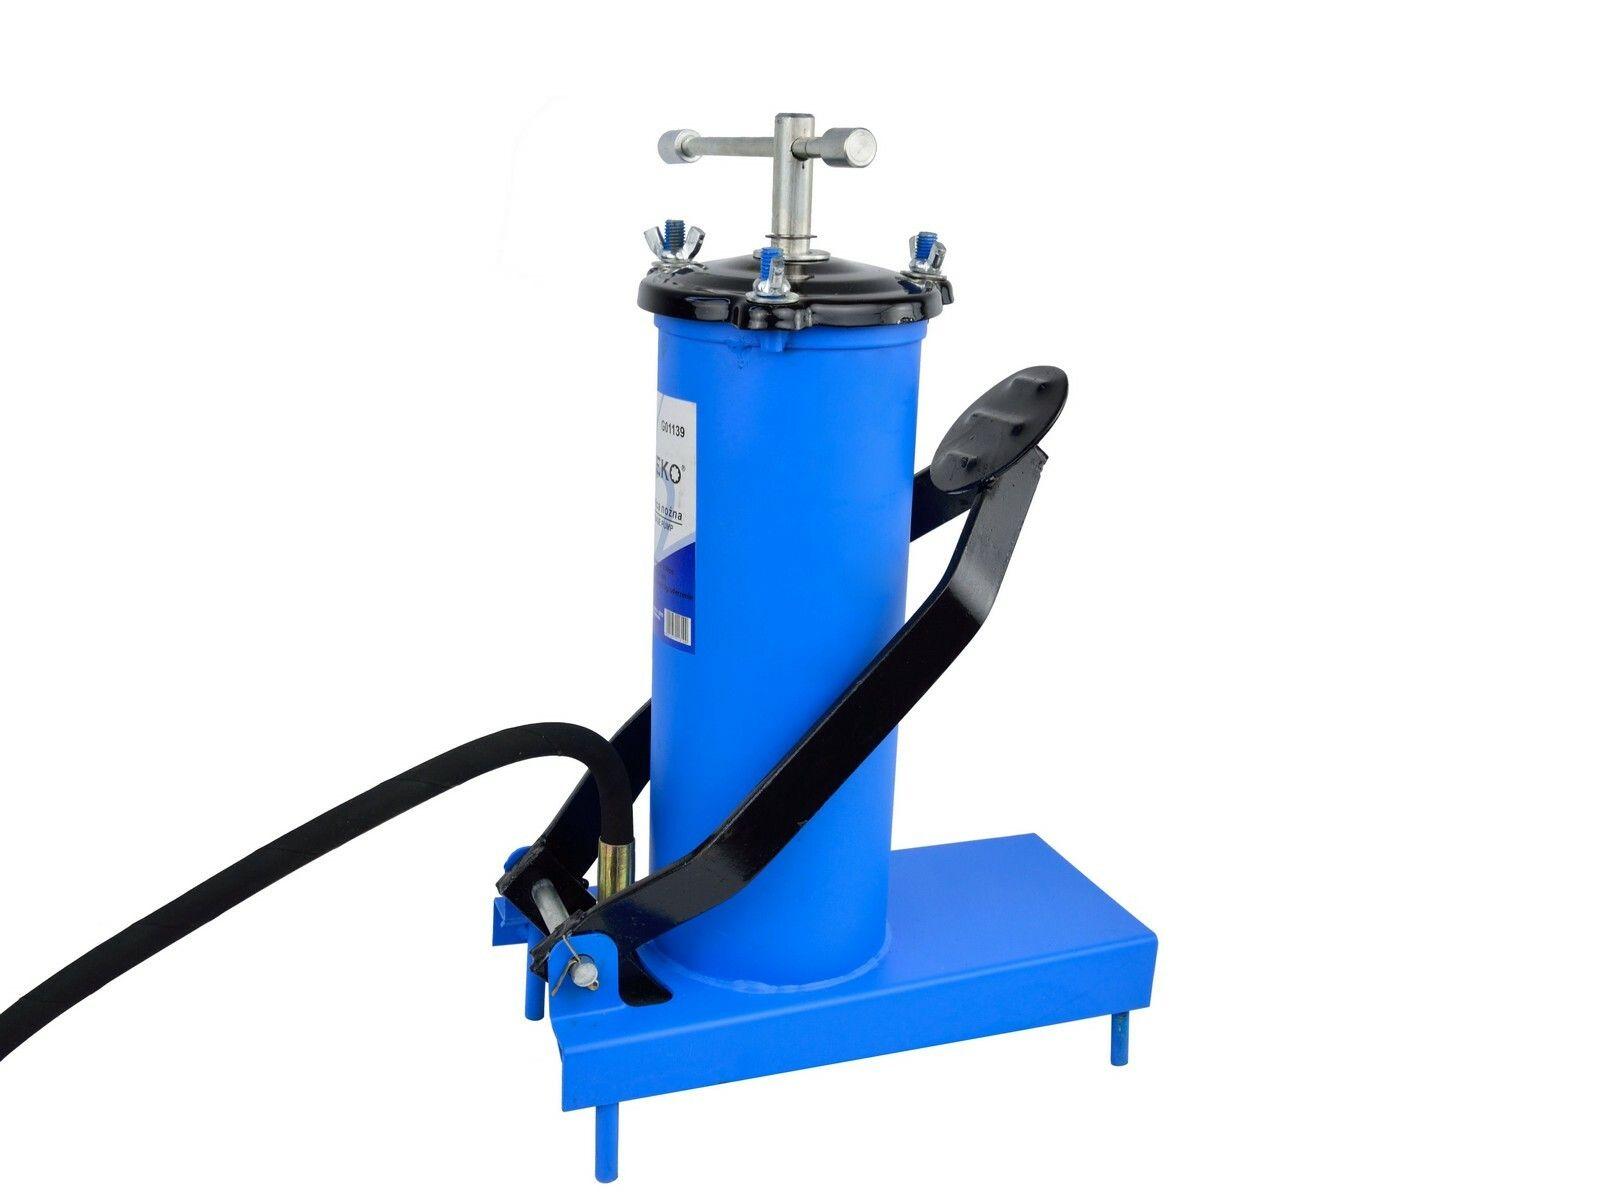 GEKO G01139 Vzduchové čerpadlo na maziva, kapacita 3l, hadice 4m